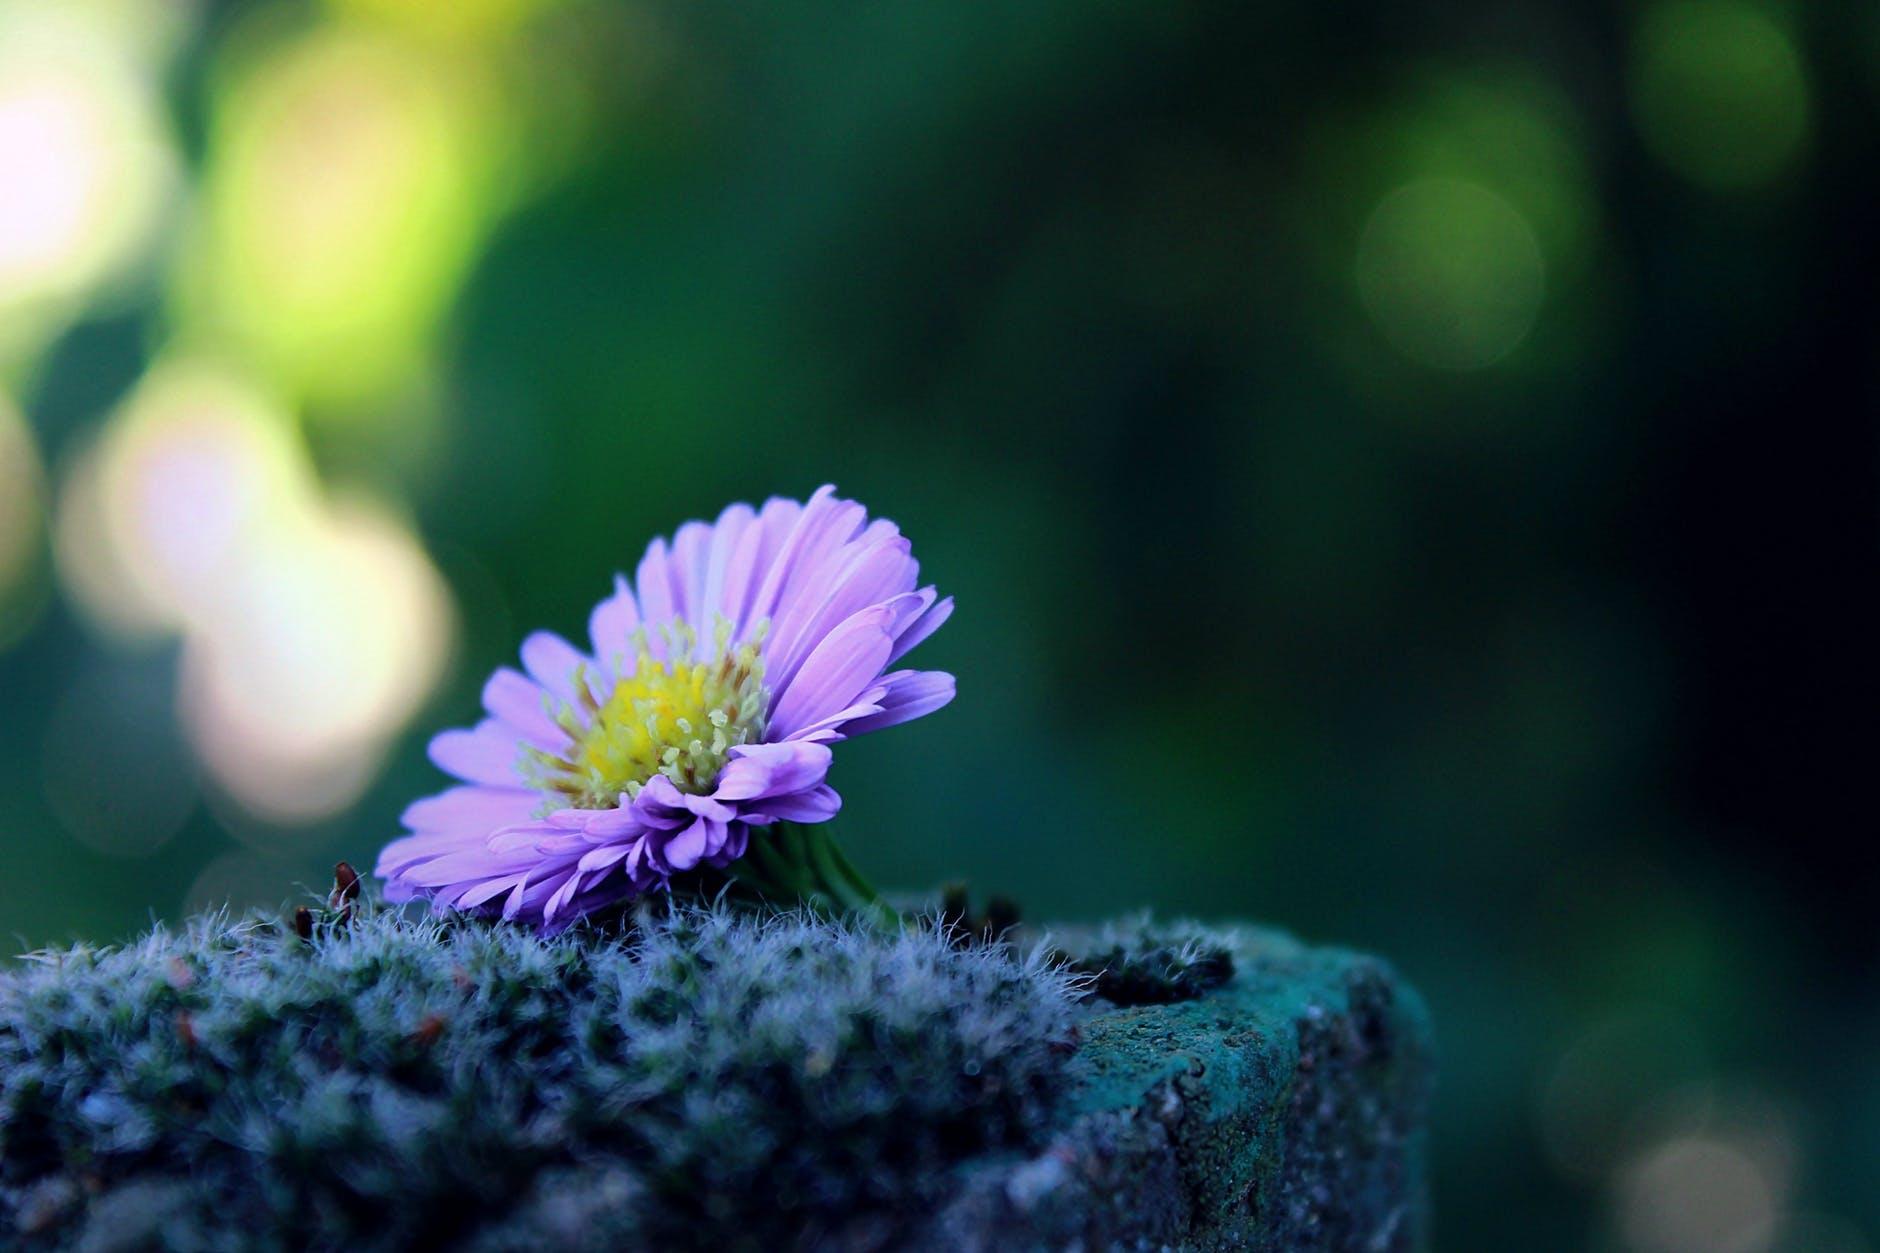 alone autumn beautiful bloom